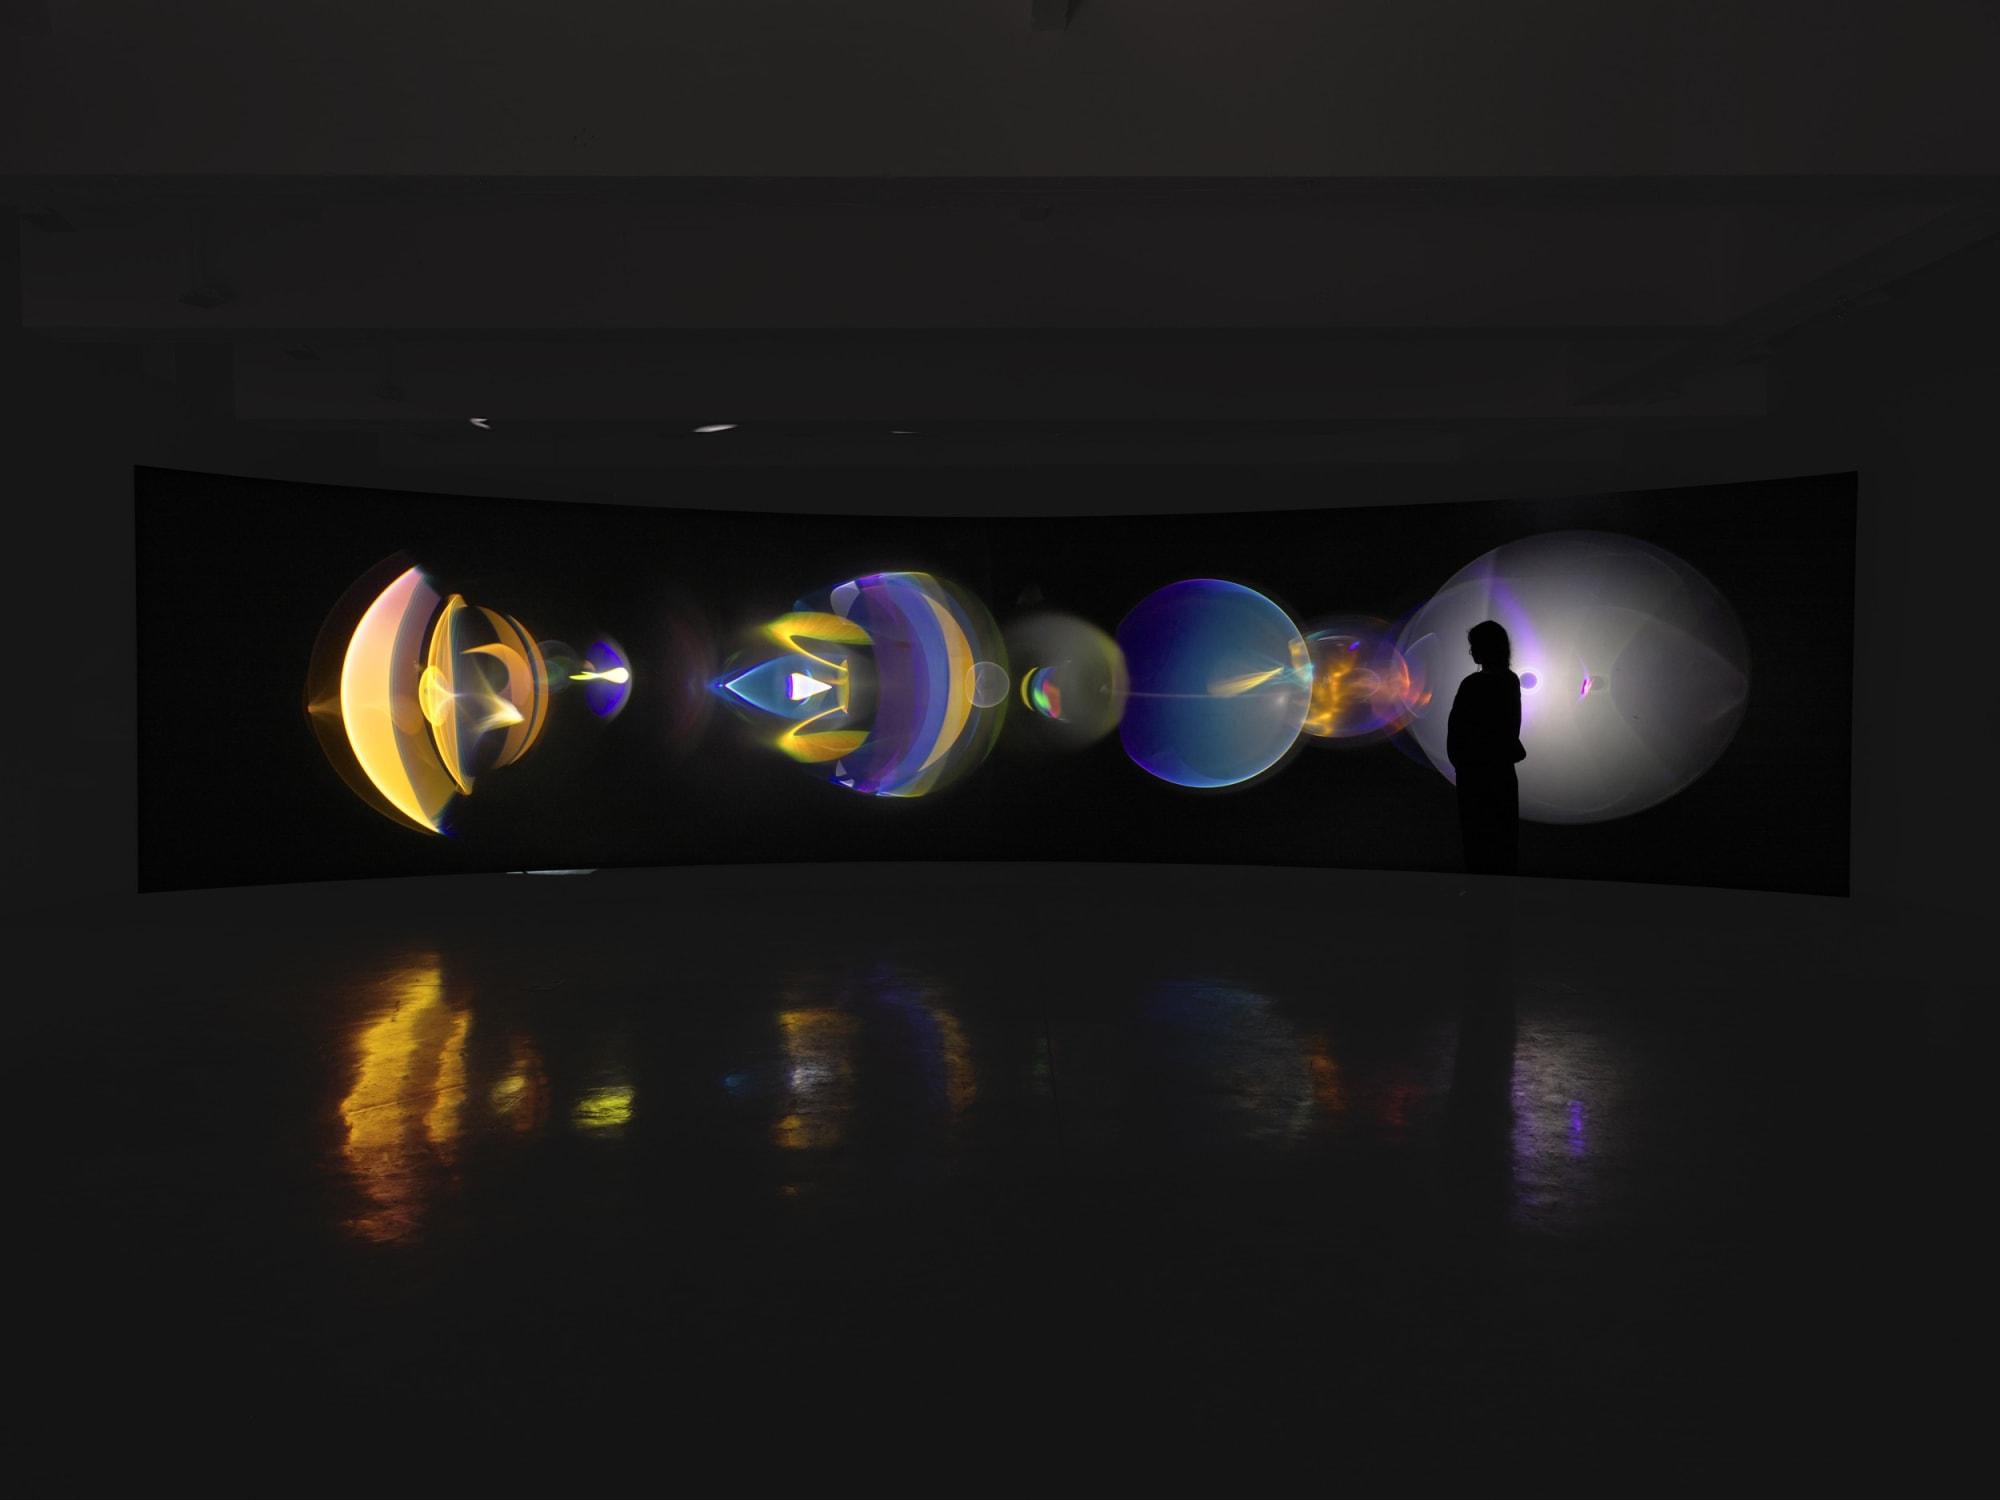 Olafur Eliasson: Your ocular relief